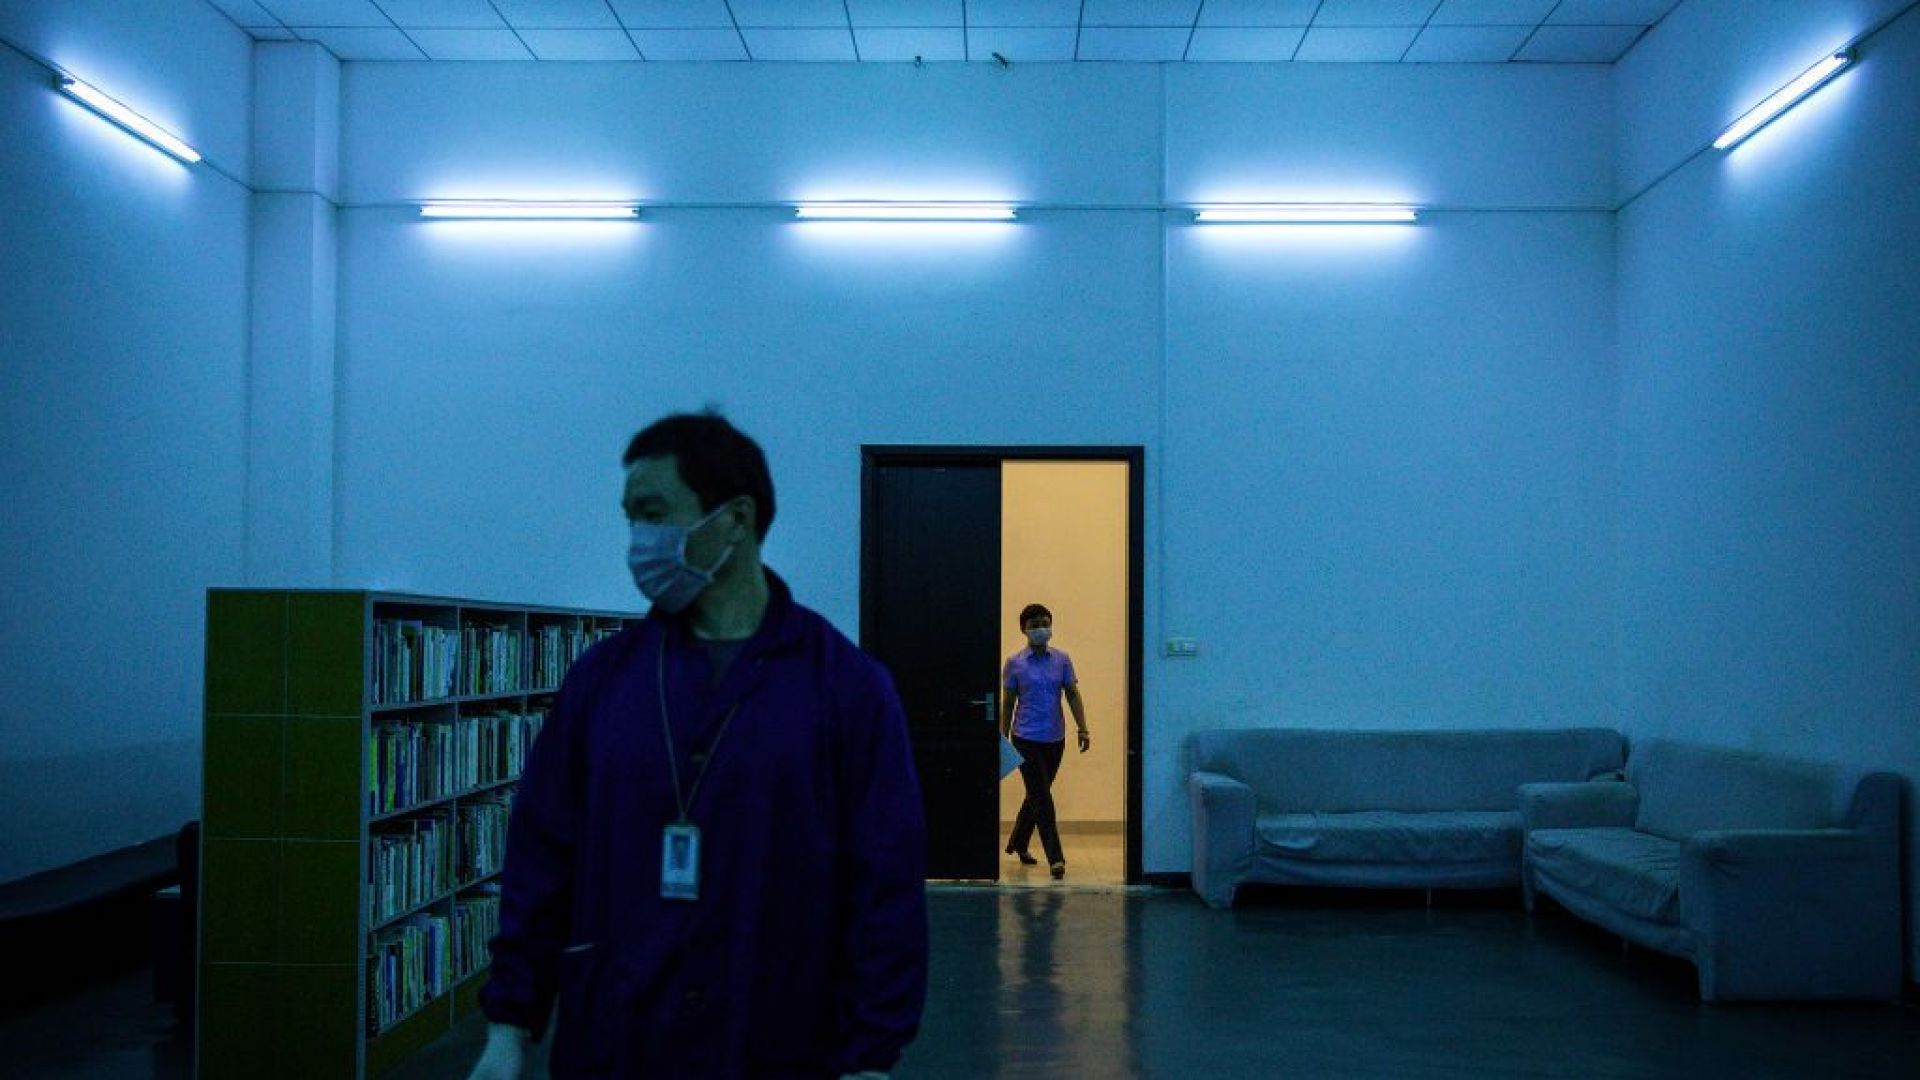 Наказват учител заради неправилна употреба на UV лампа, изгорила деца в Бистрица